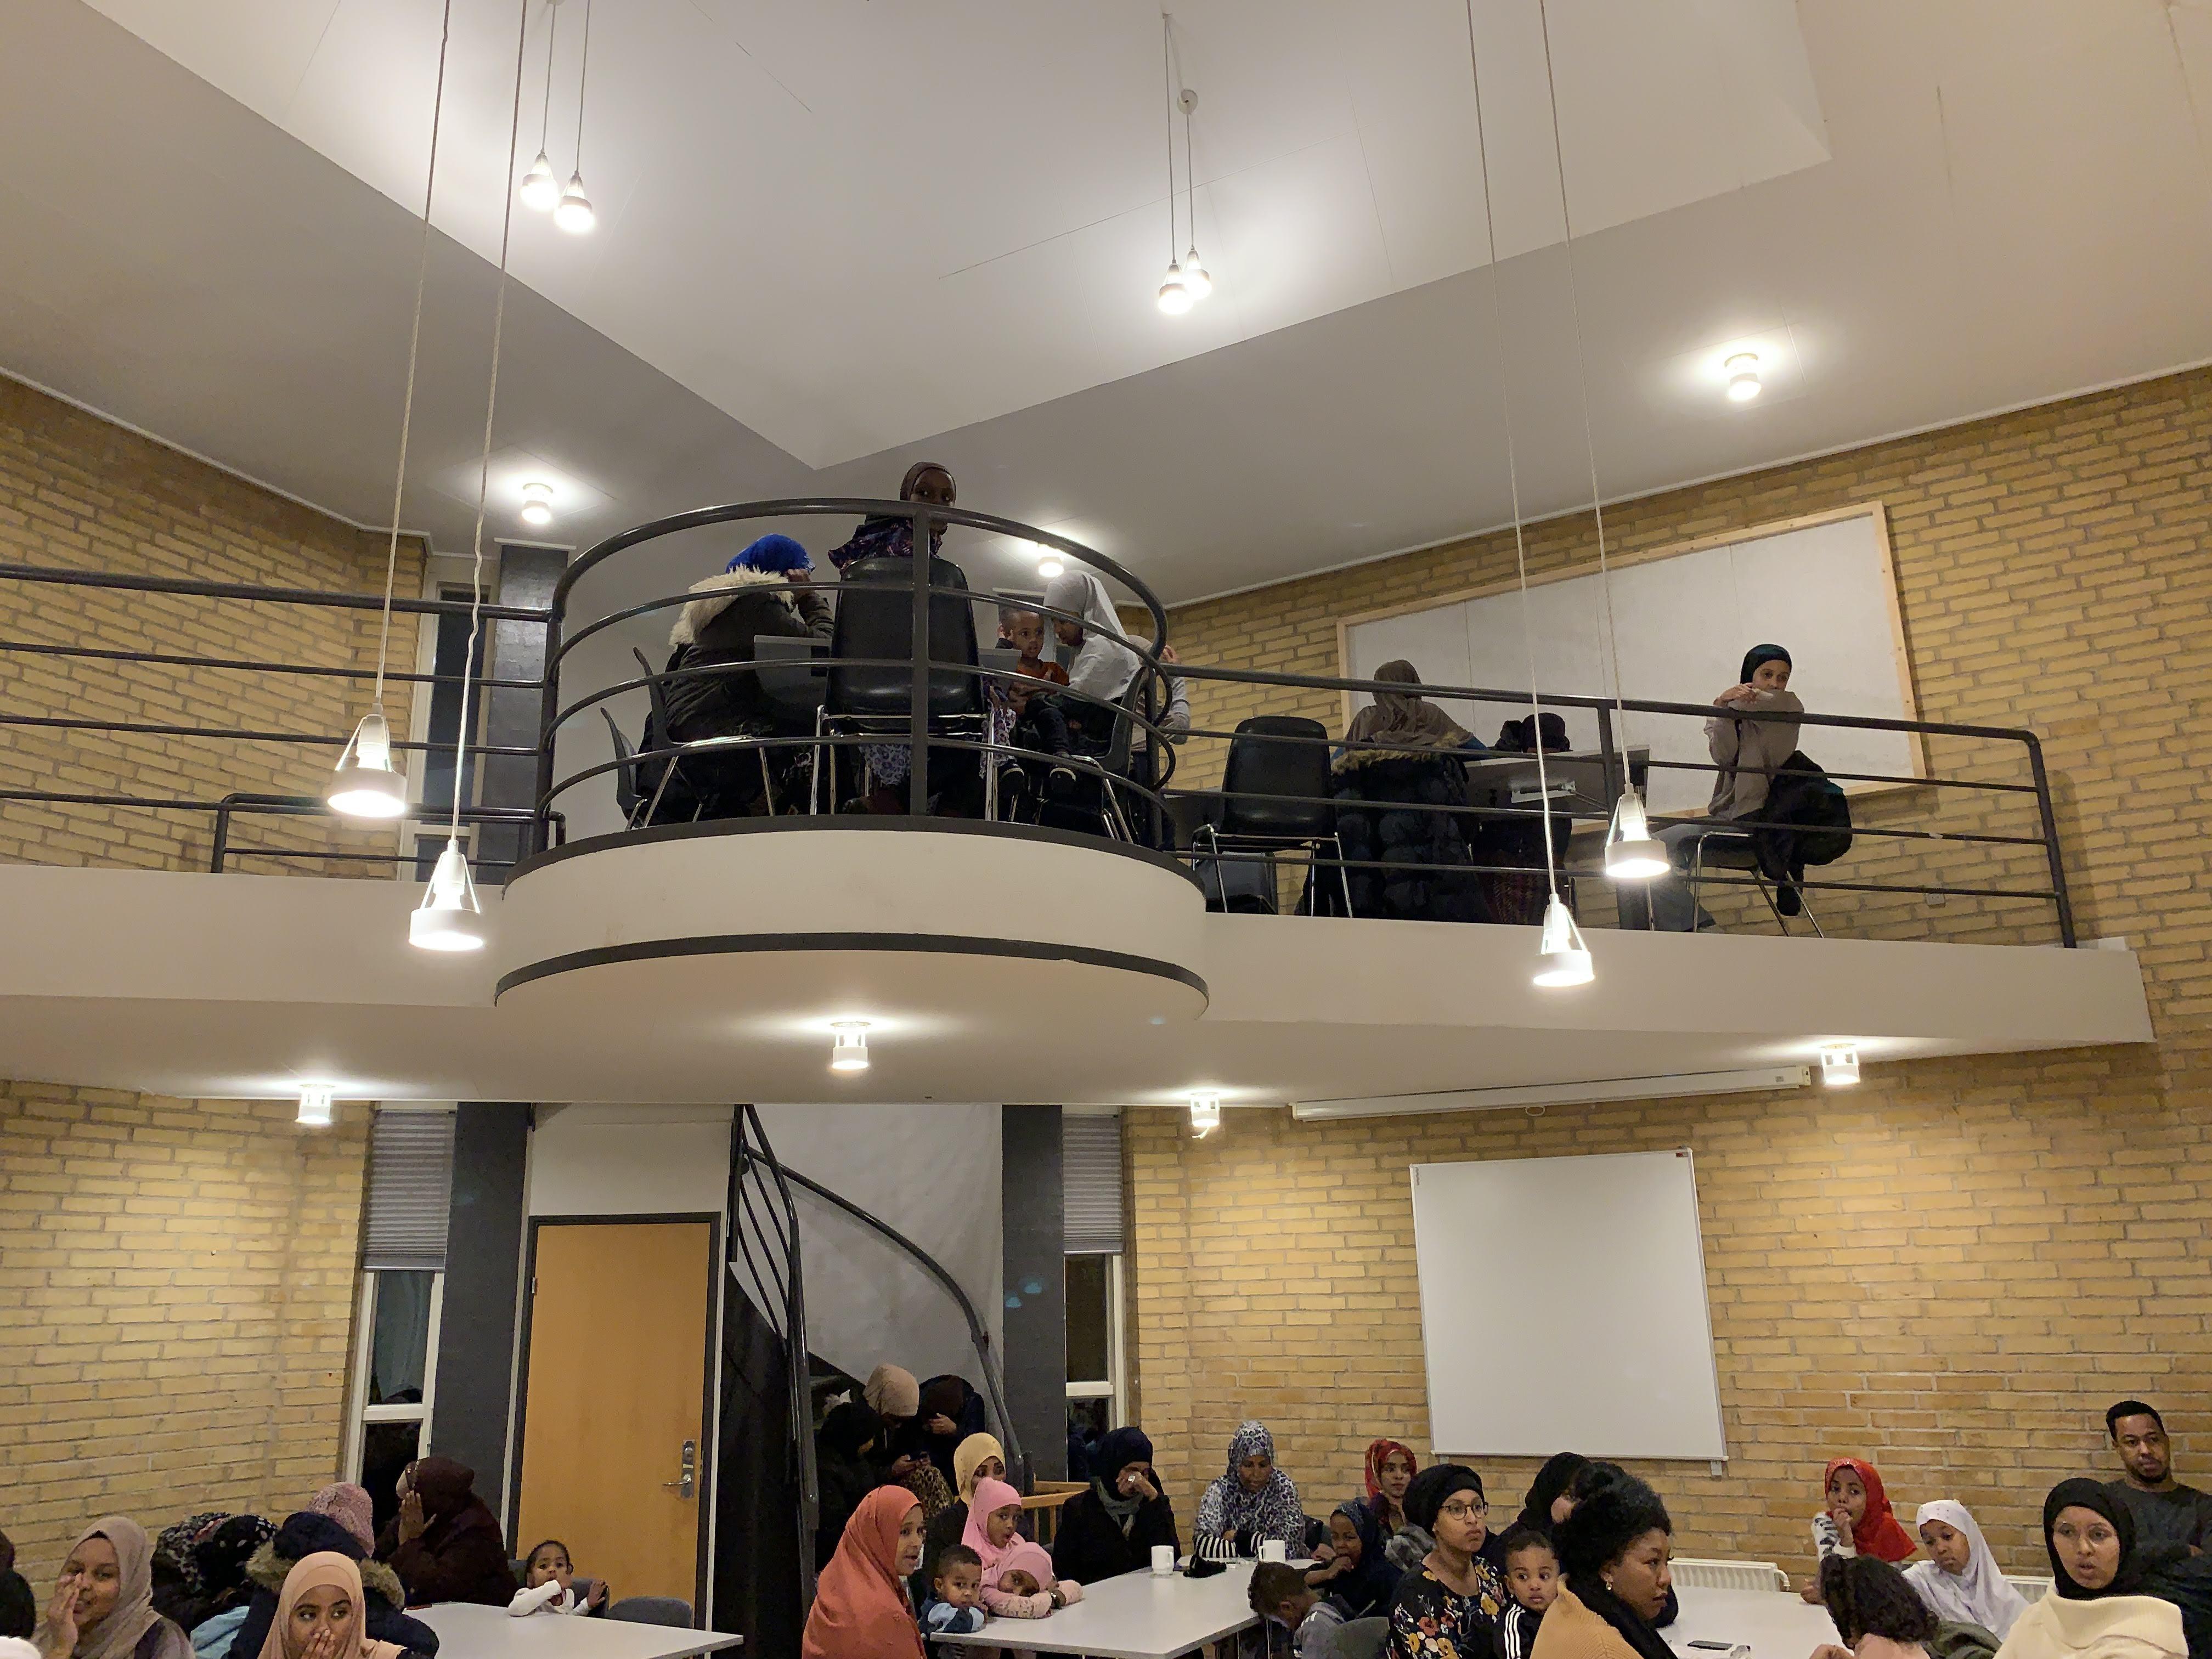 fællesspisning-den-28-12-2019-i-beboerhuset-på-Ellekonebakken-020